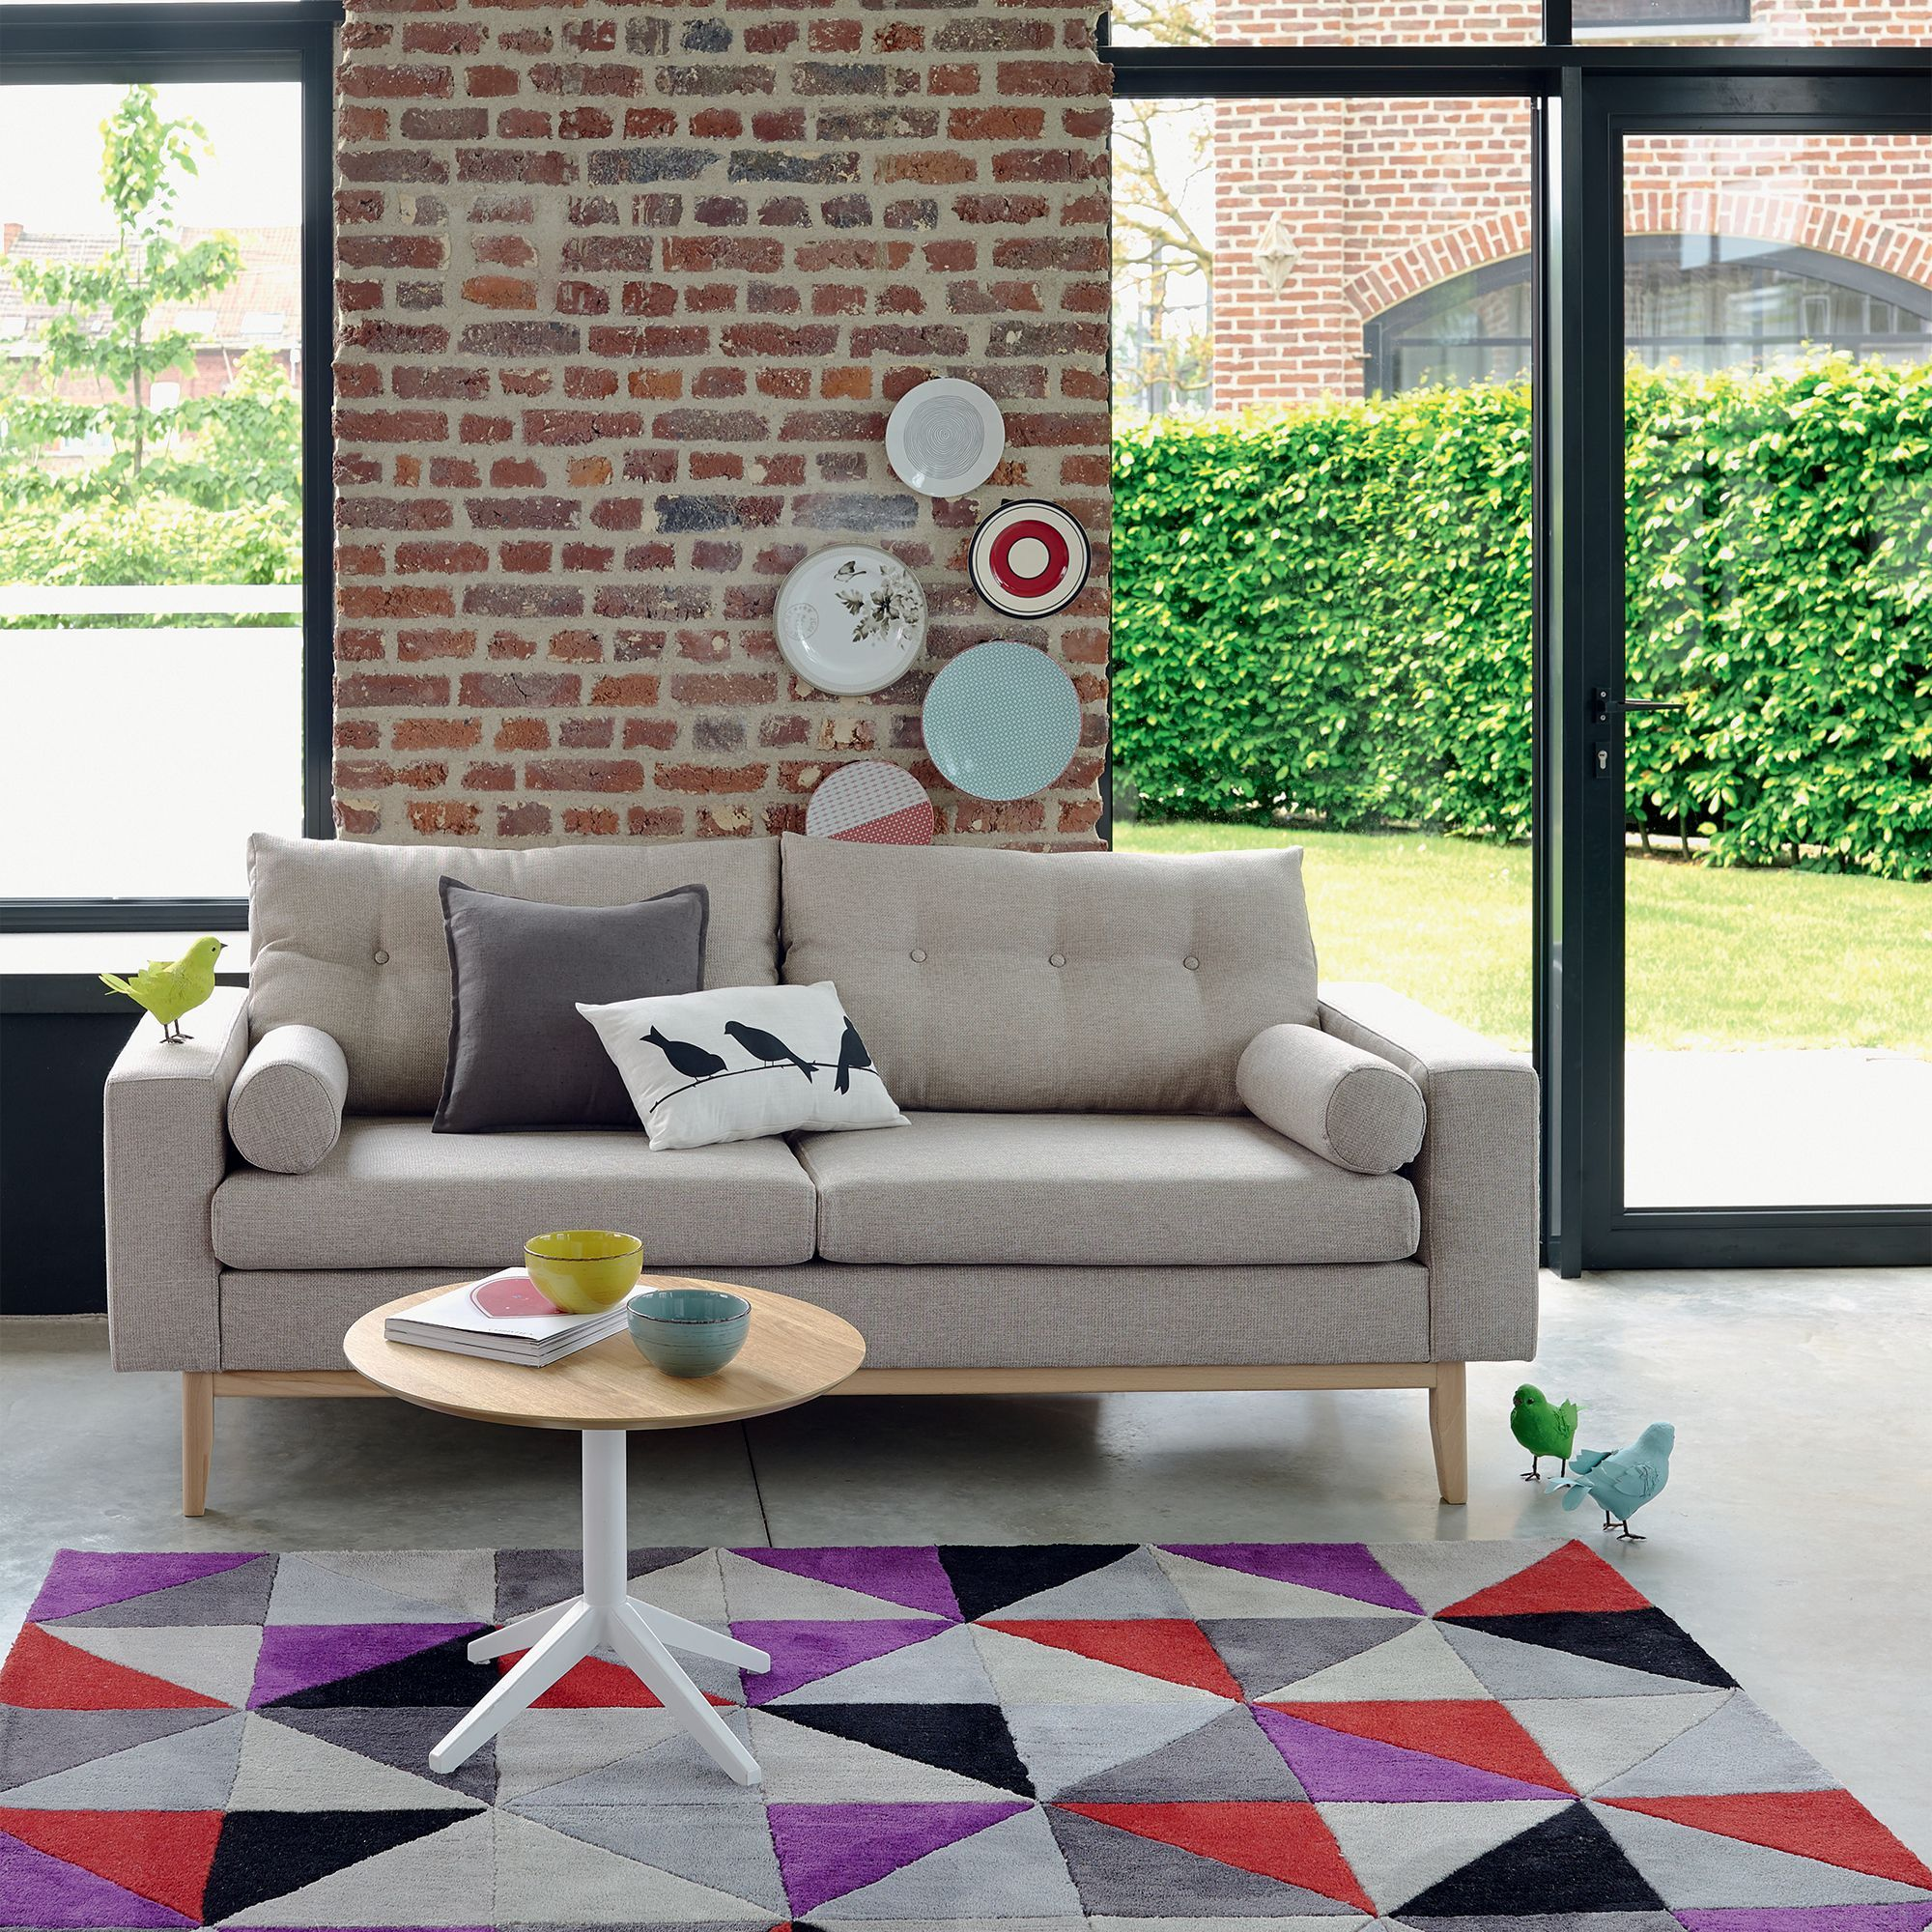 canap vintage fixe cru kenora alinea living room. Black Bedroom Furniture Sets. Home Design Ideas